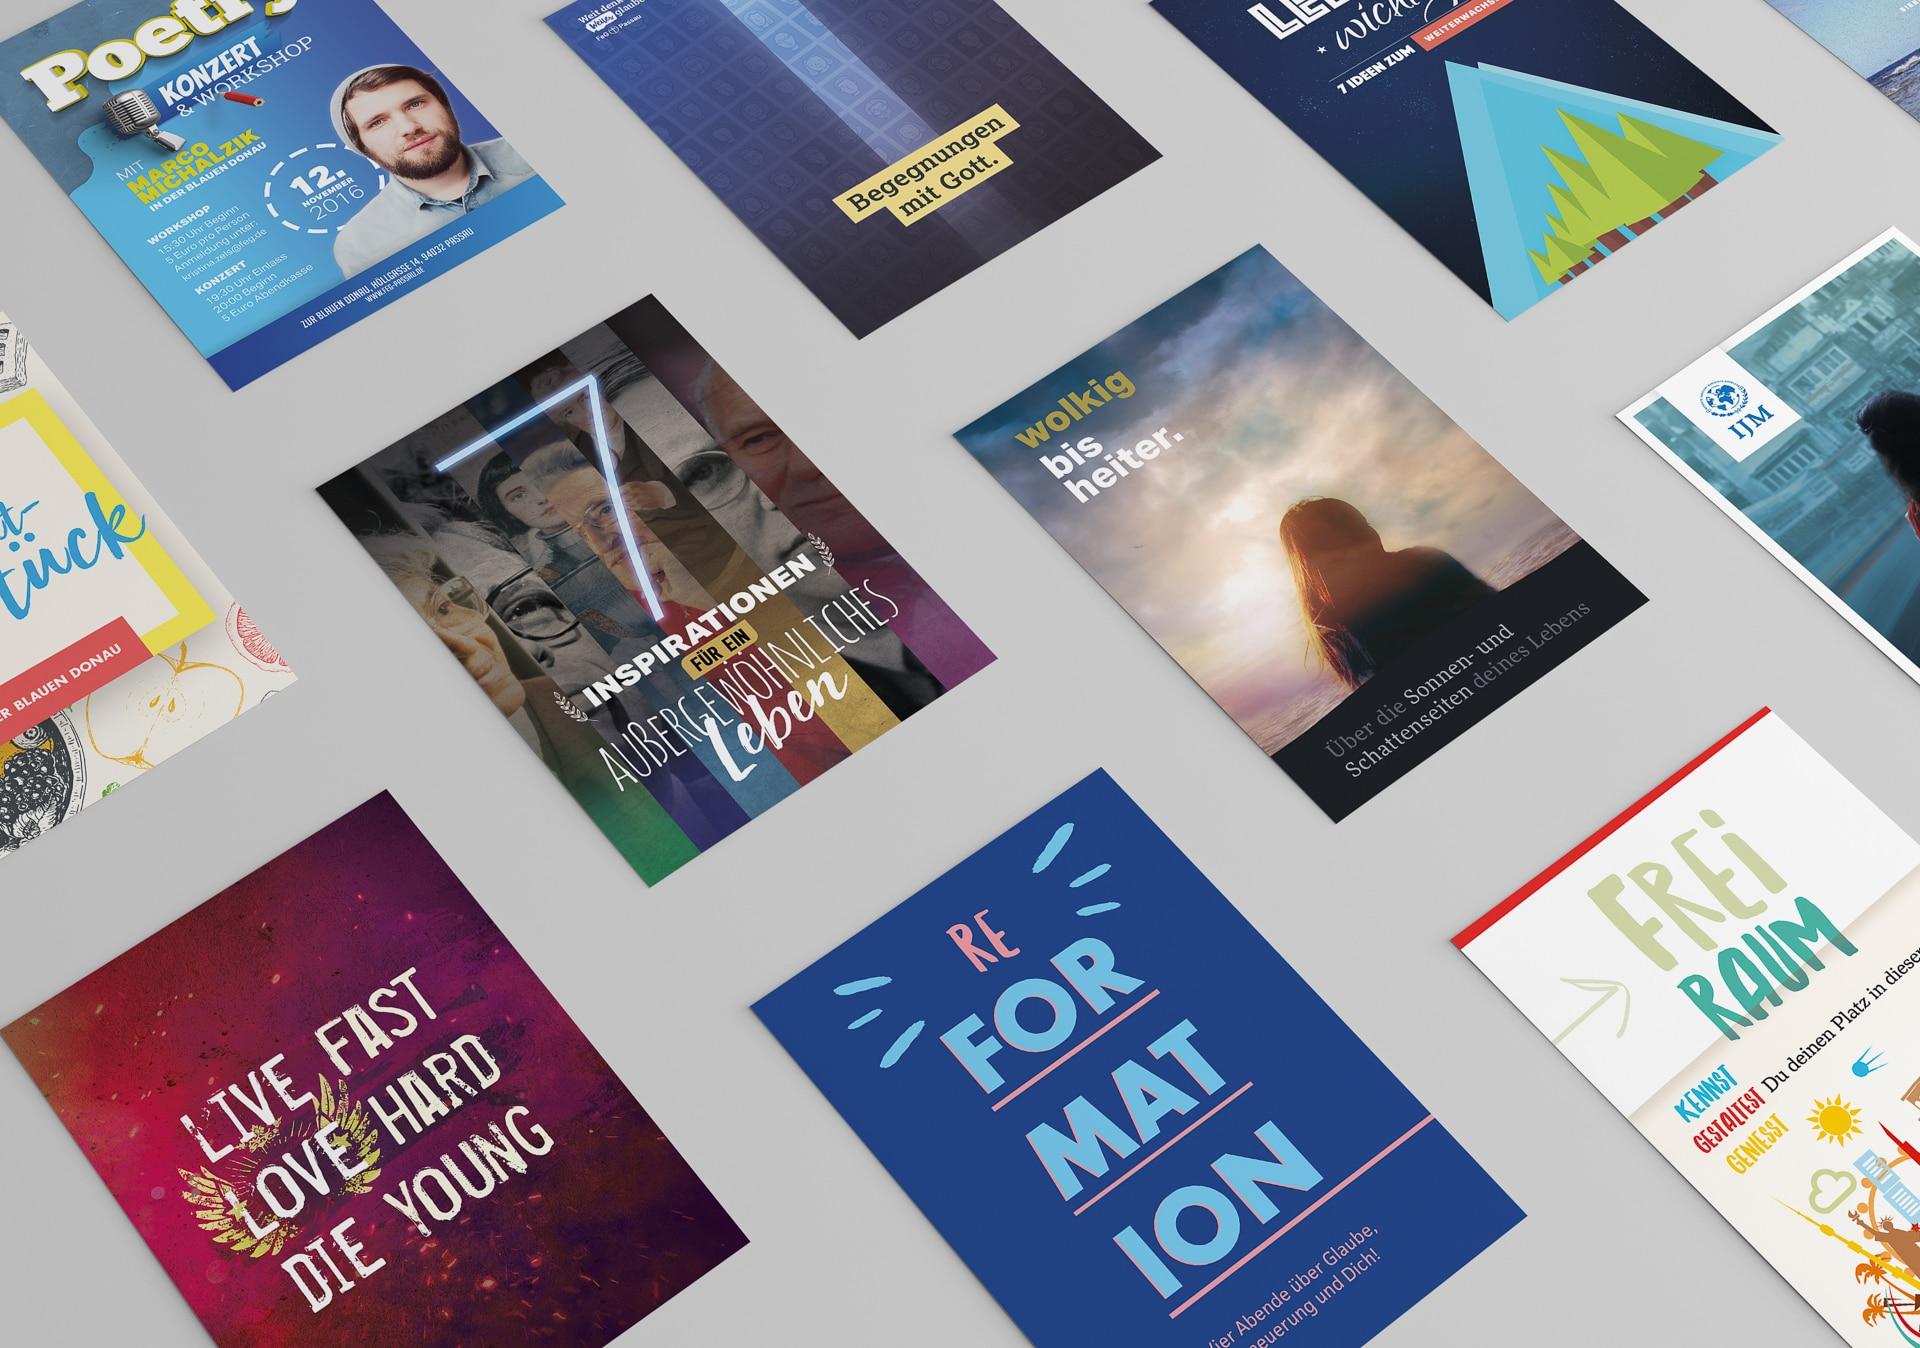 fegpa-mockup-flyer-collage_web_xxl